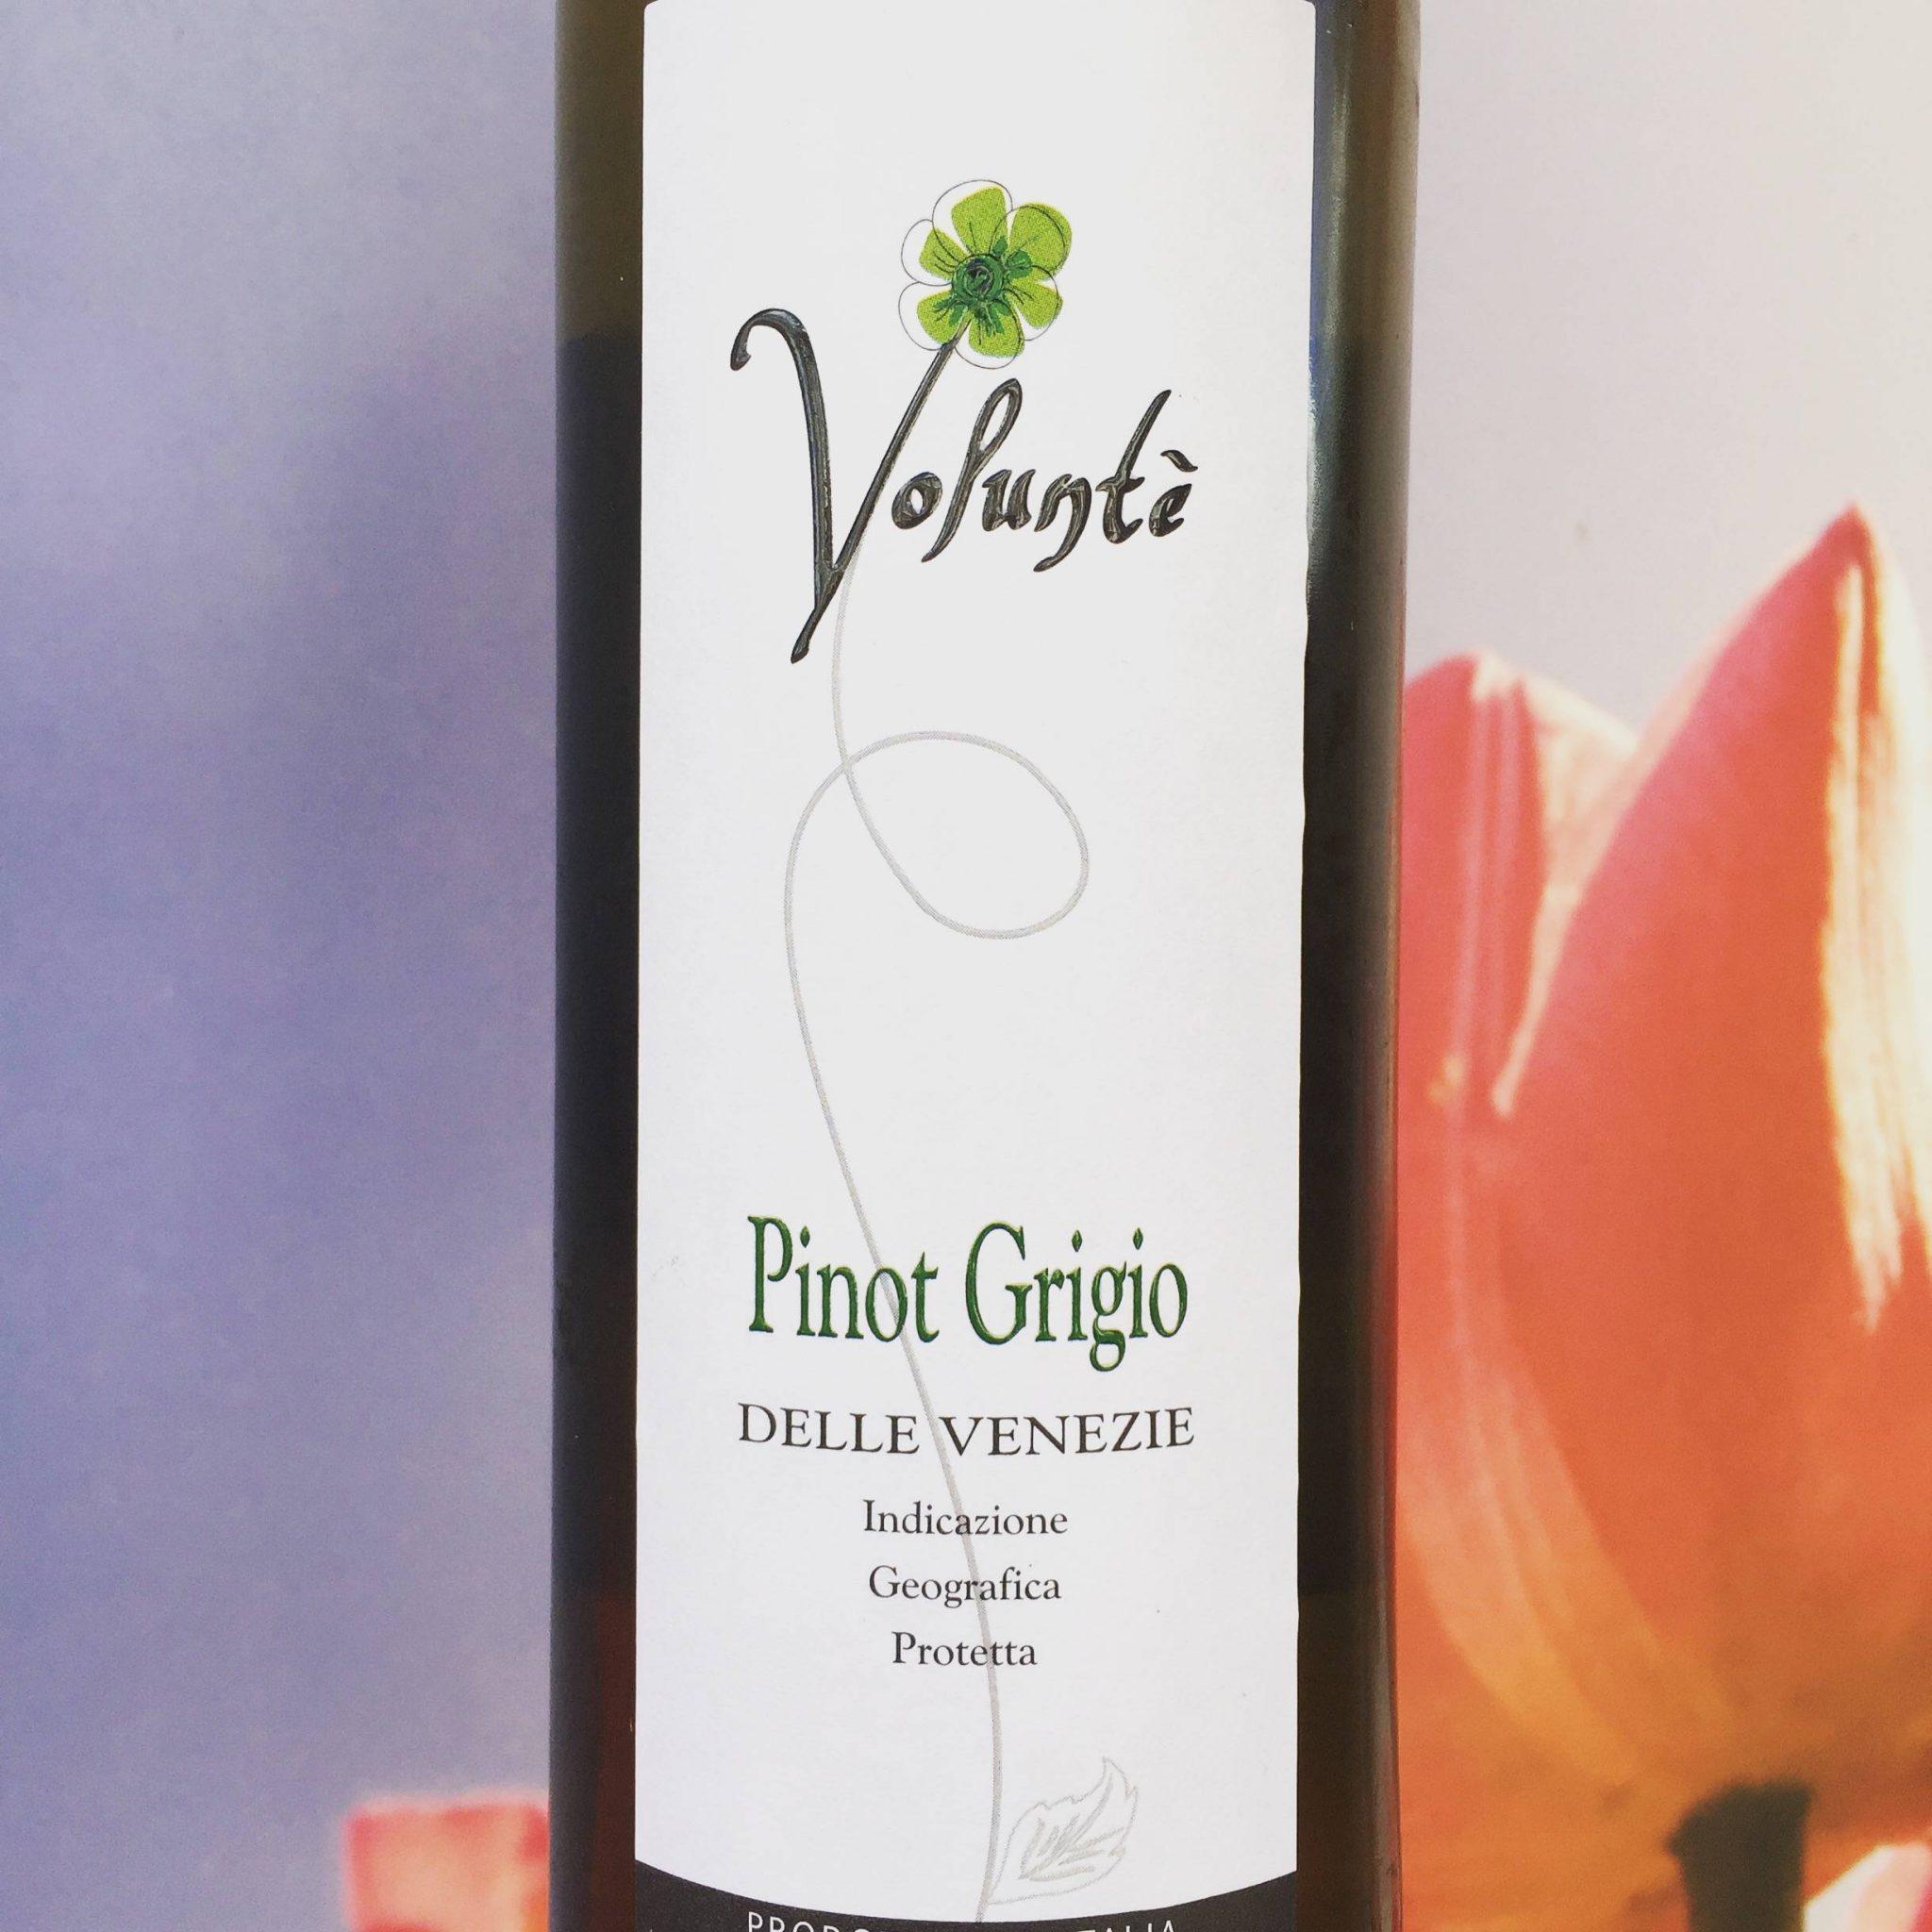 Volunté Pinot Grigio, Review